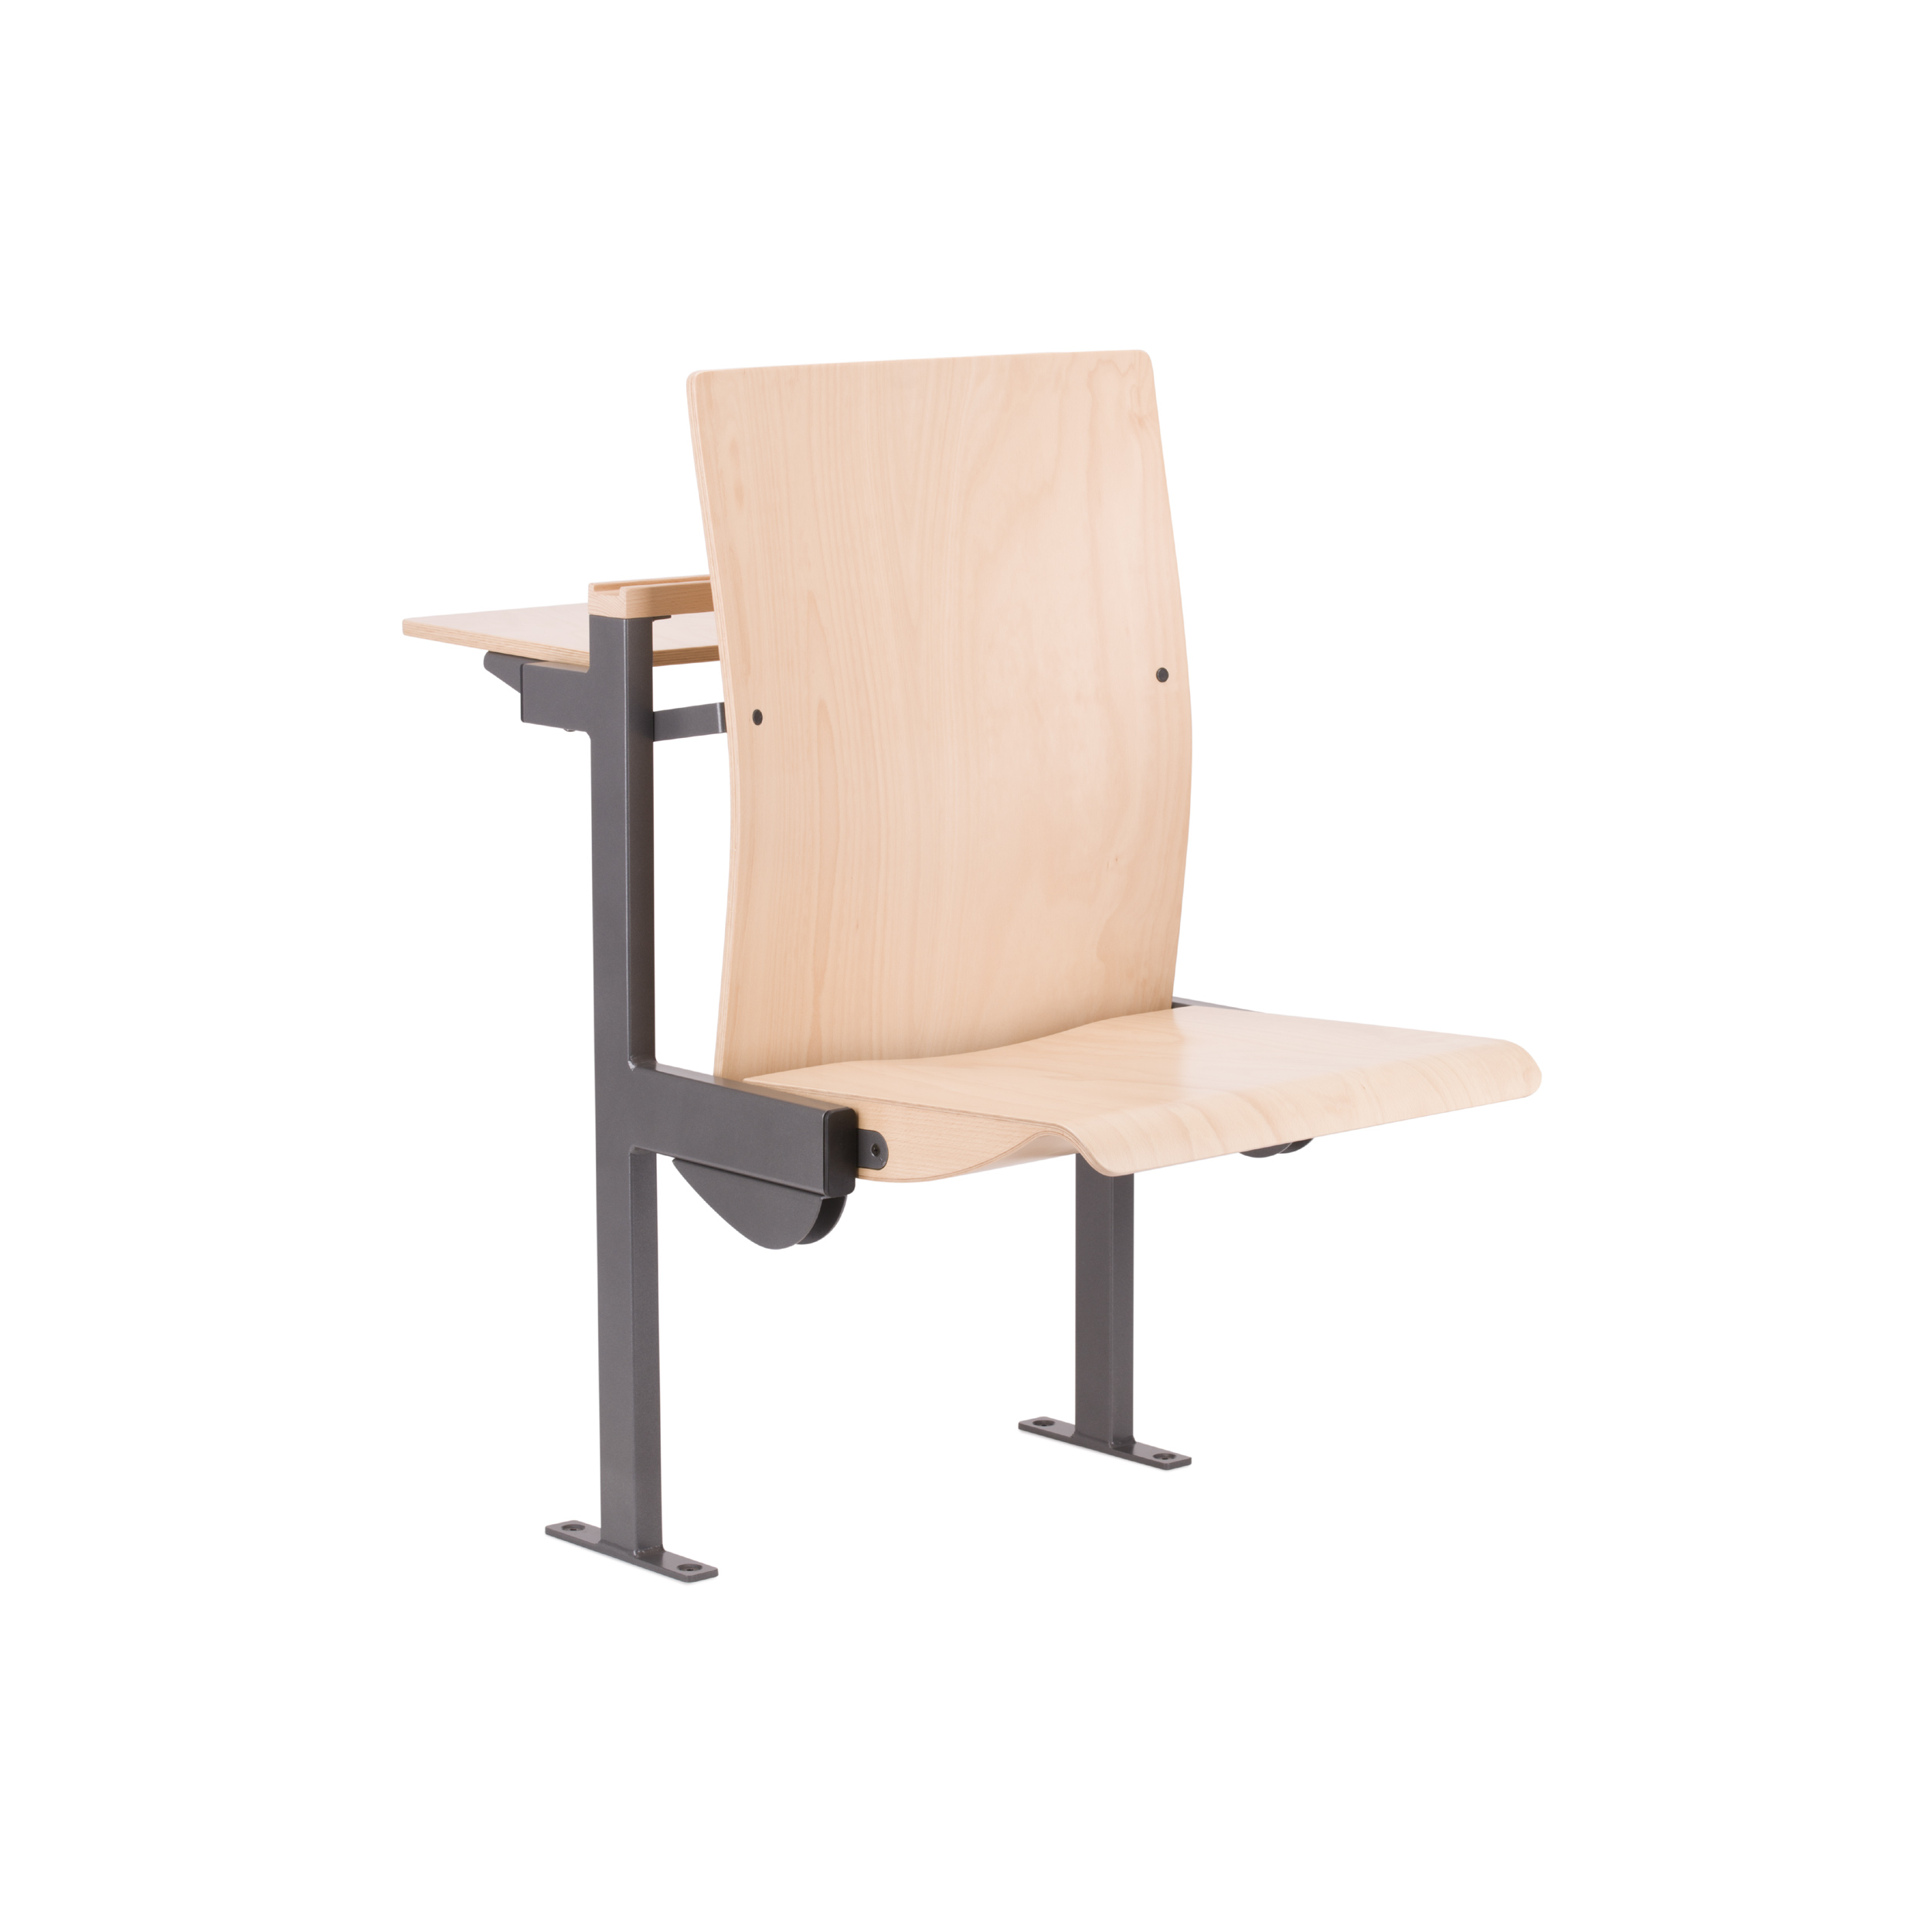 forum-seating_1-1_foster-1.jpg